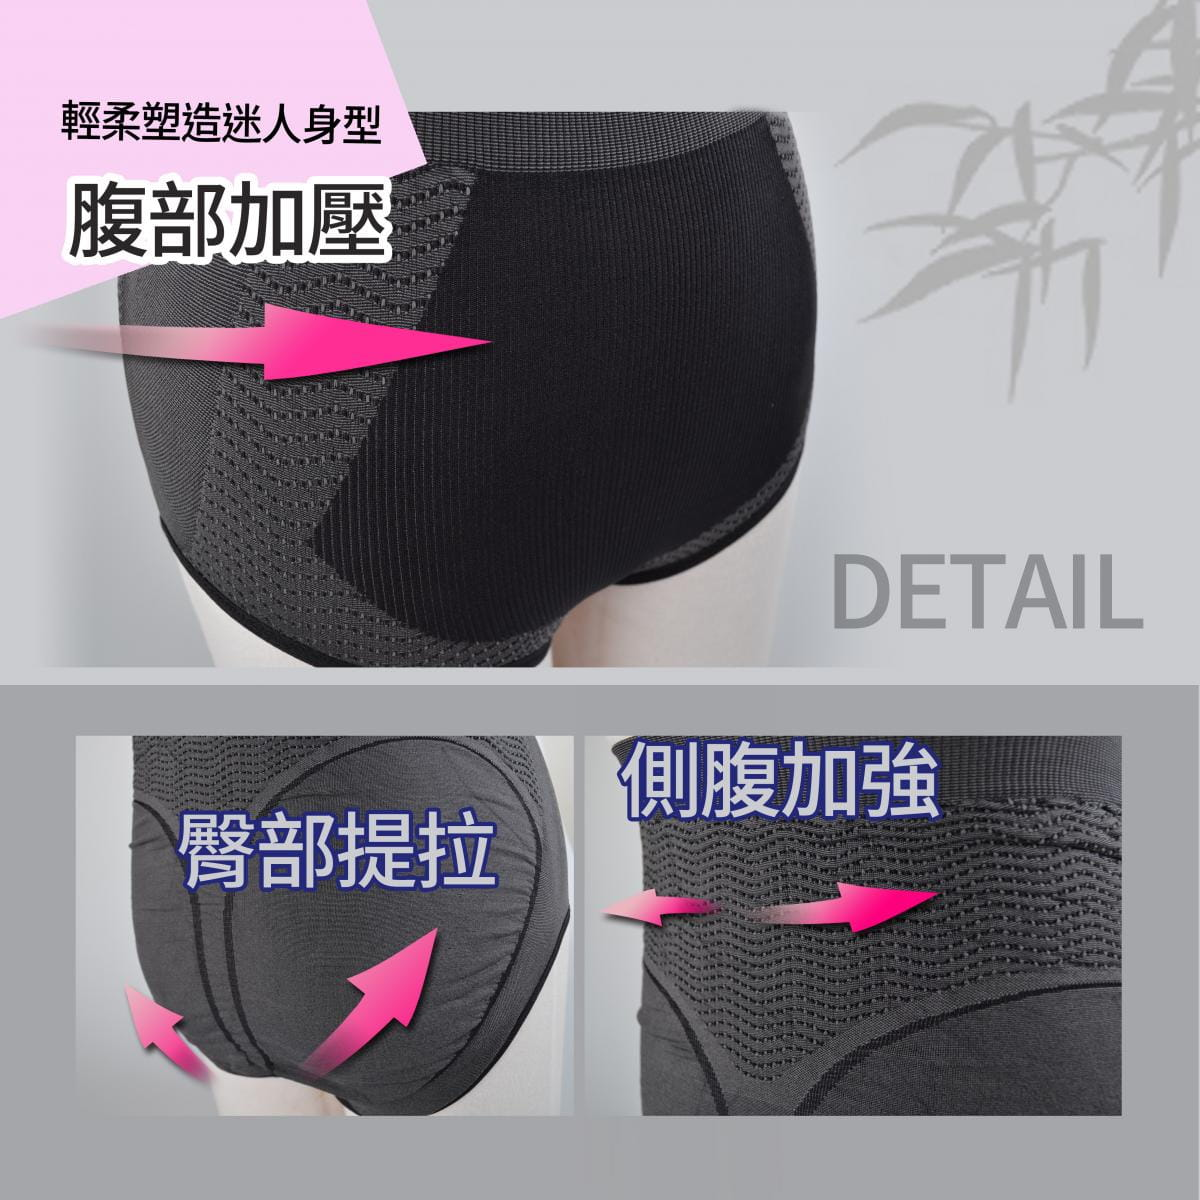 【DR.WOW】竹炭機能塑身三角褲 1